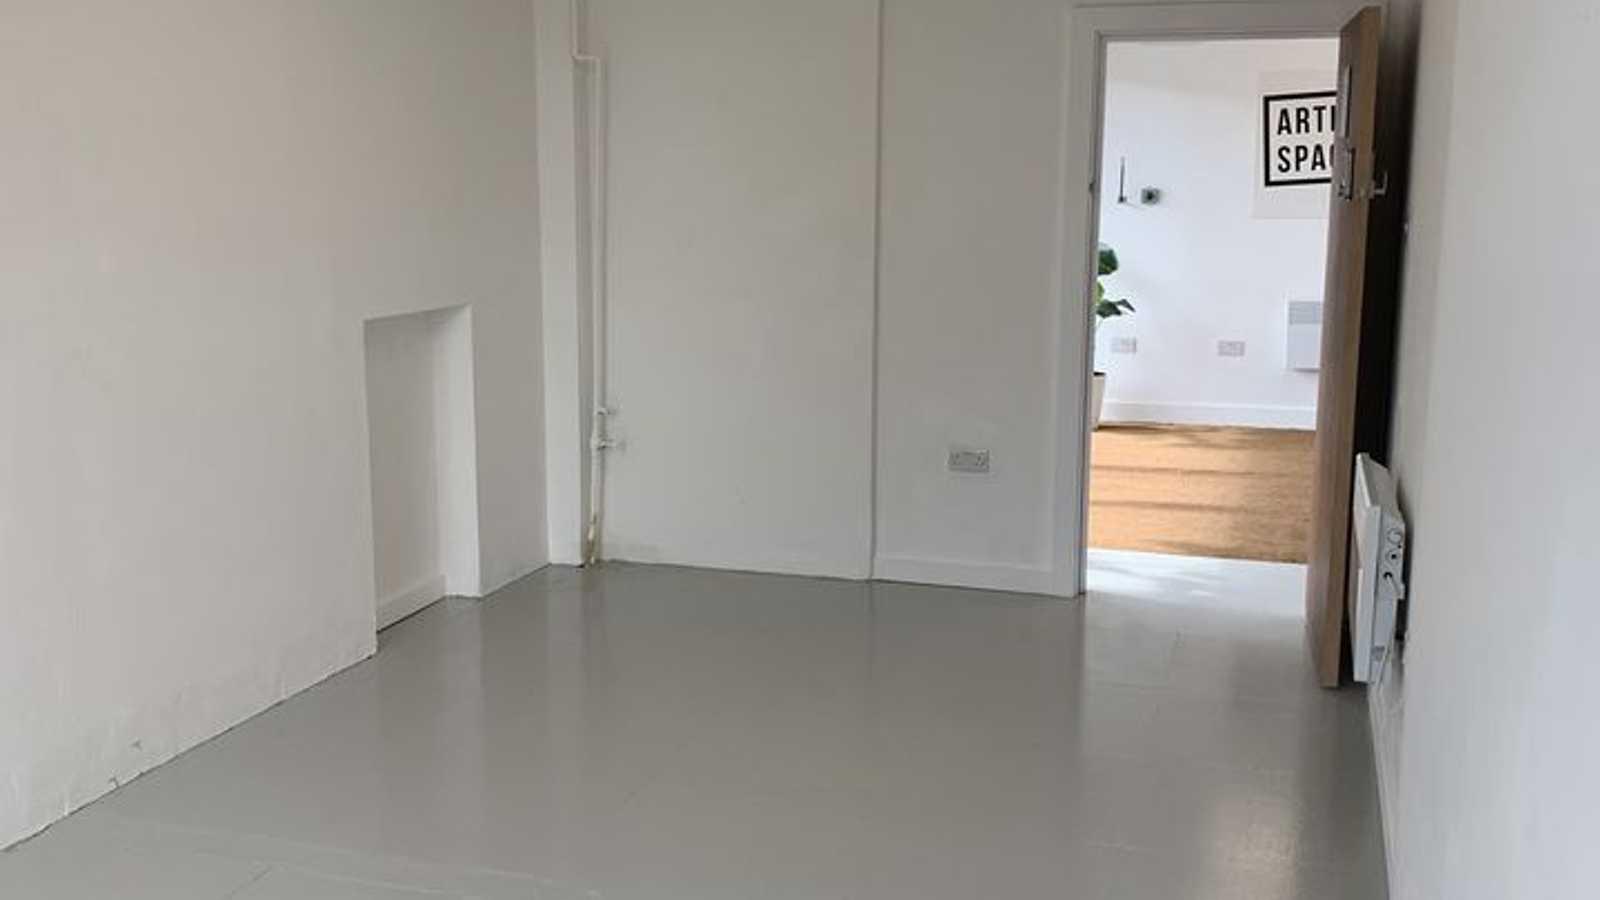 Creative space - 1 - Oxgate House - Brent Cross